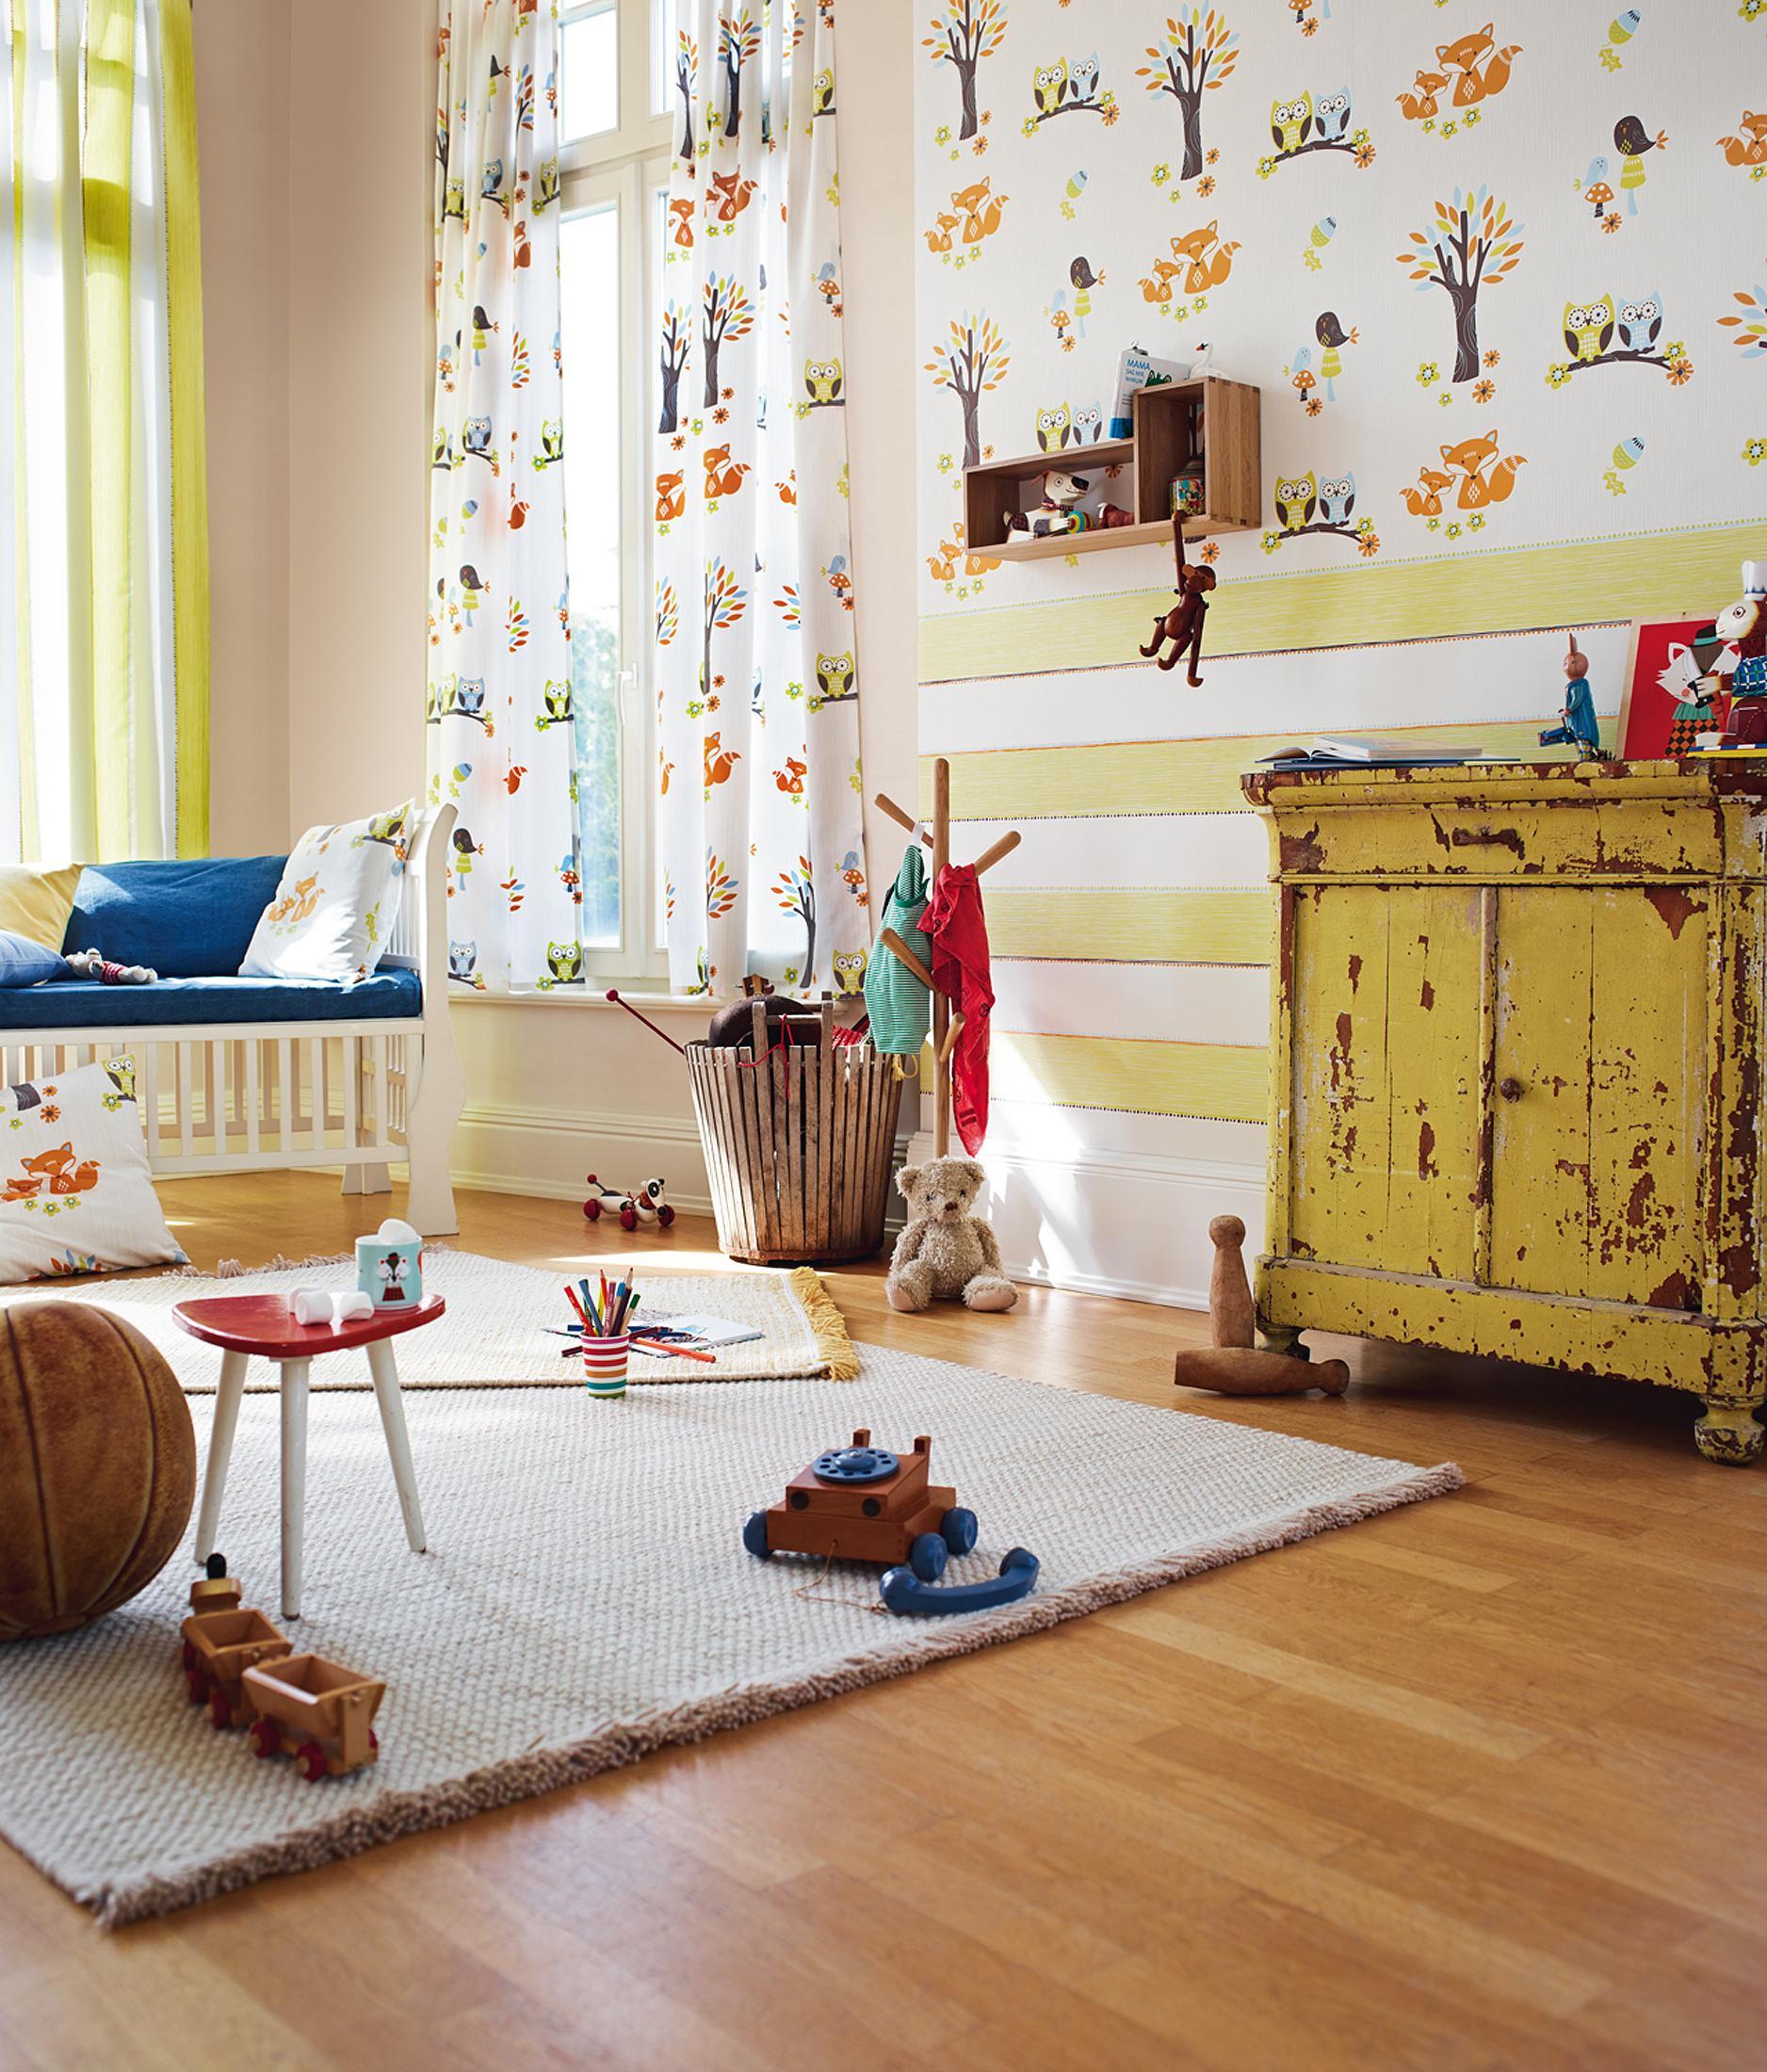 Fuchs Bilder Ideen Couch